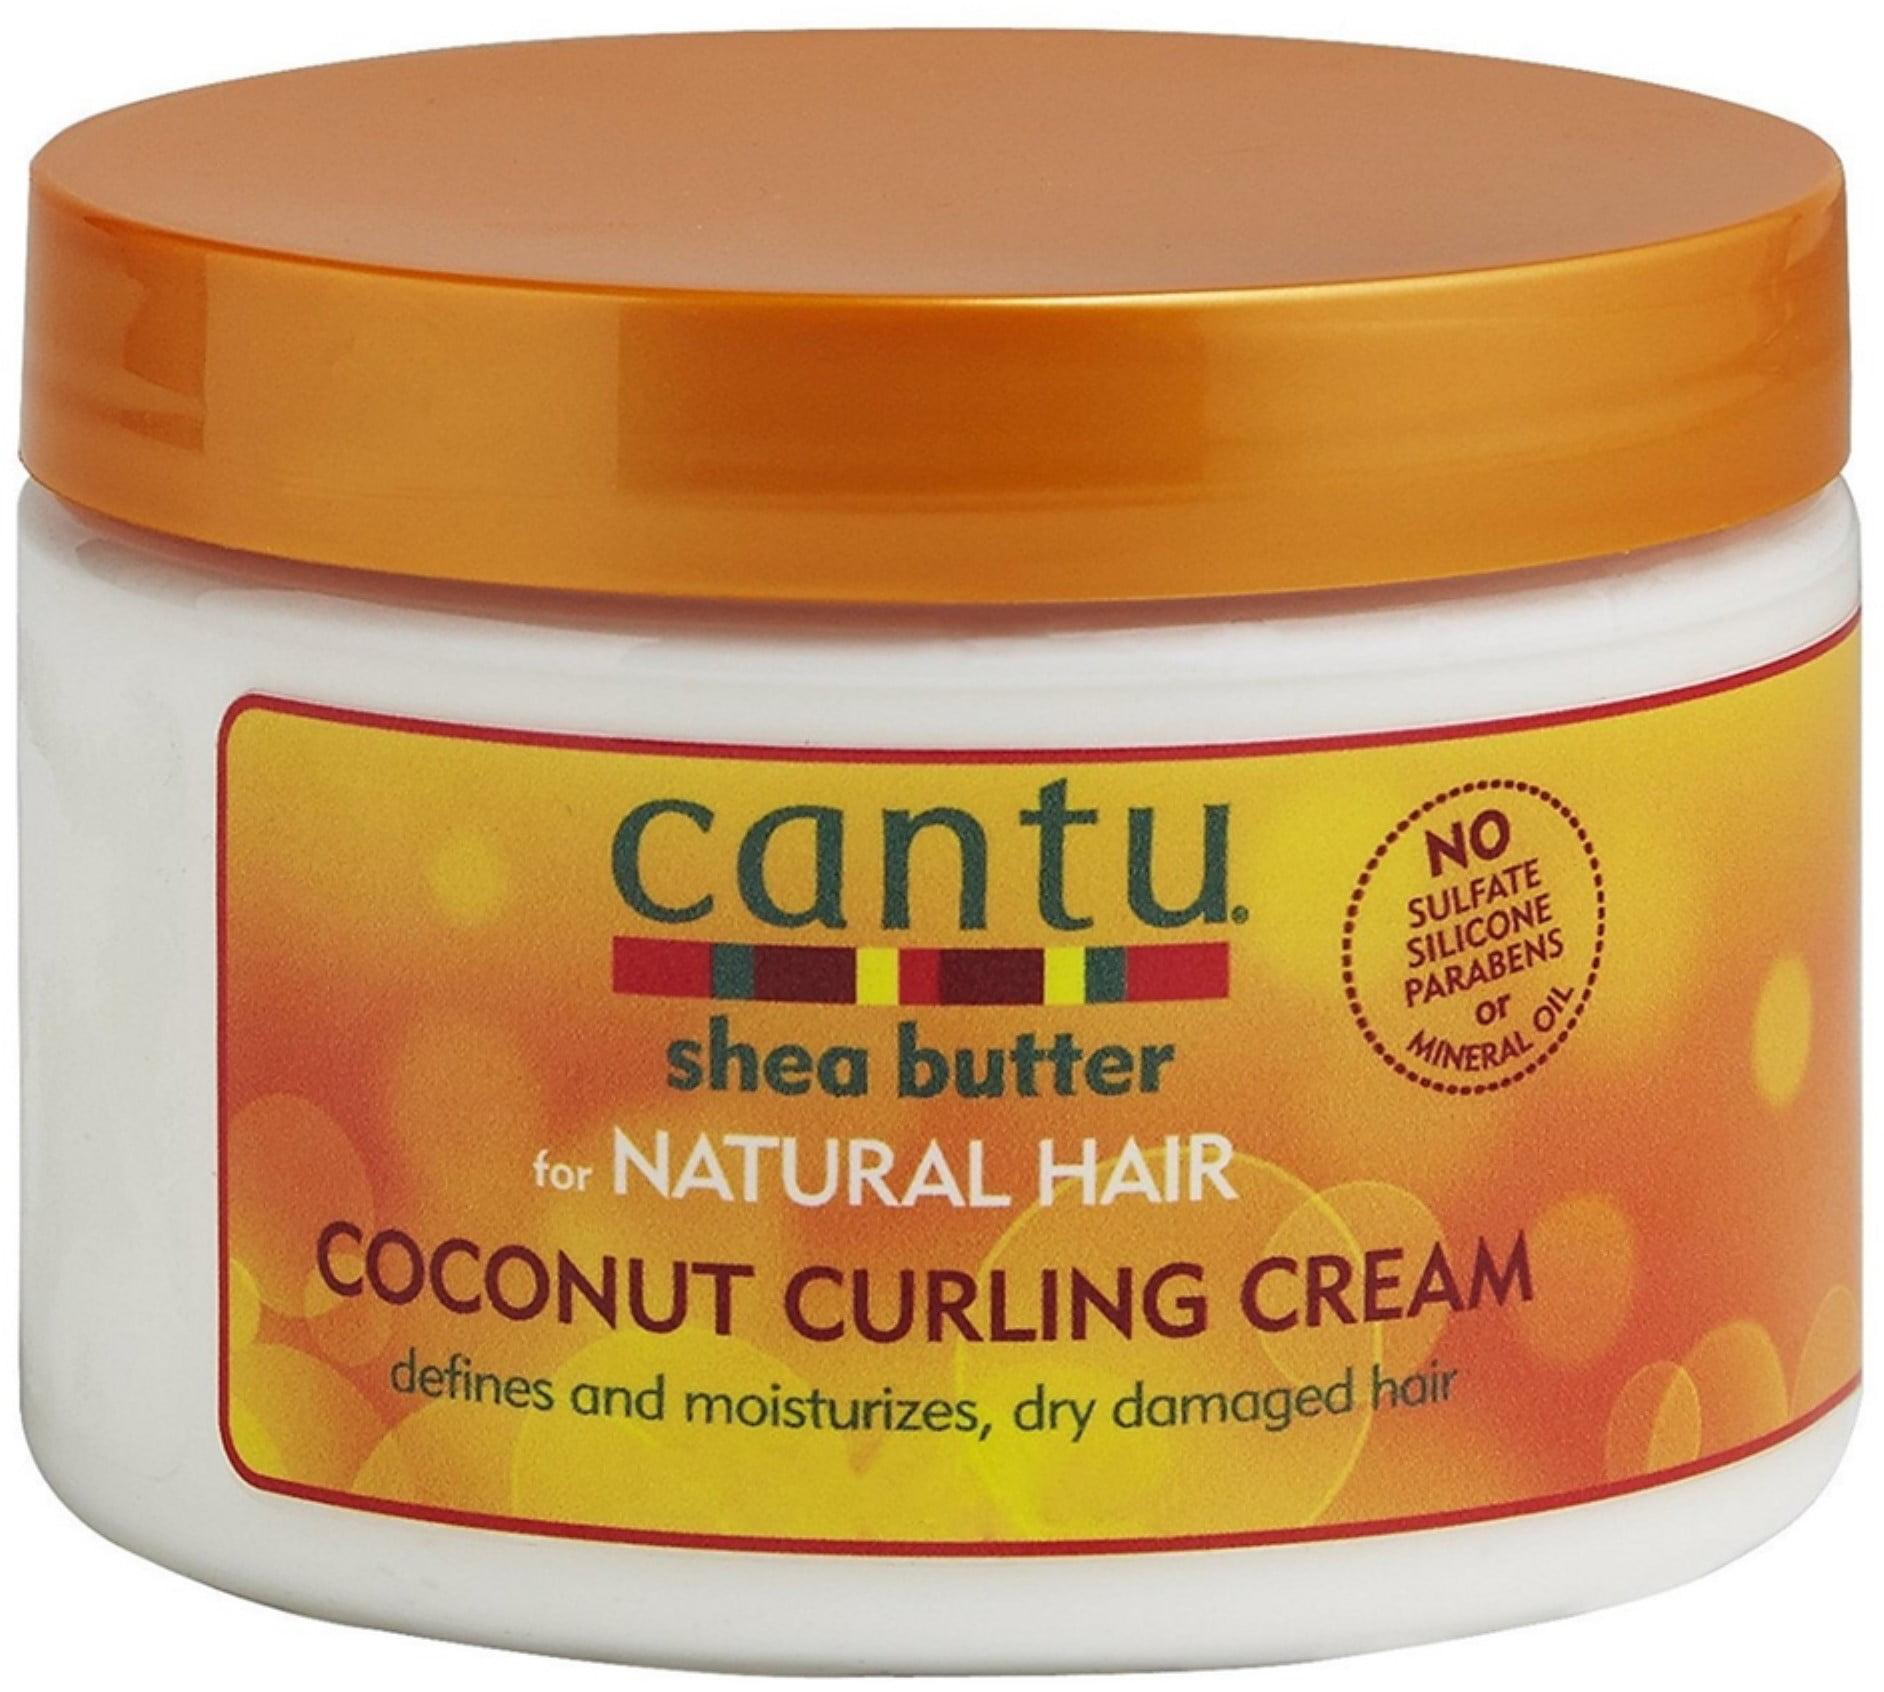 2 Pack Cantu Shea Butter For Natural Hair Coconut Curling Cream 12 Oz Walmart Com Walmart Com